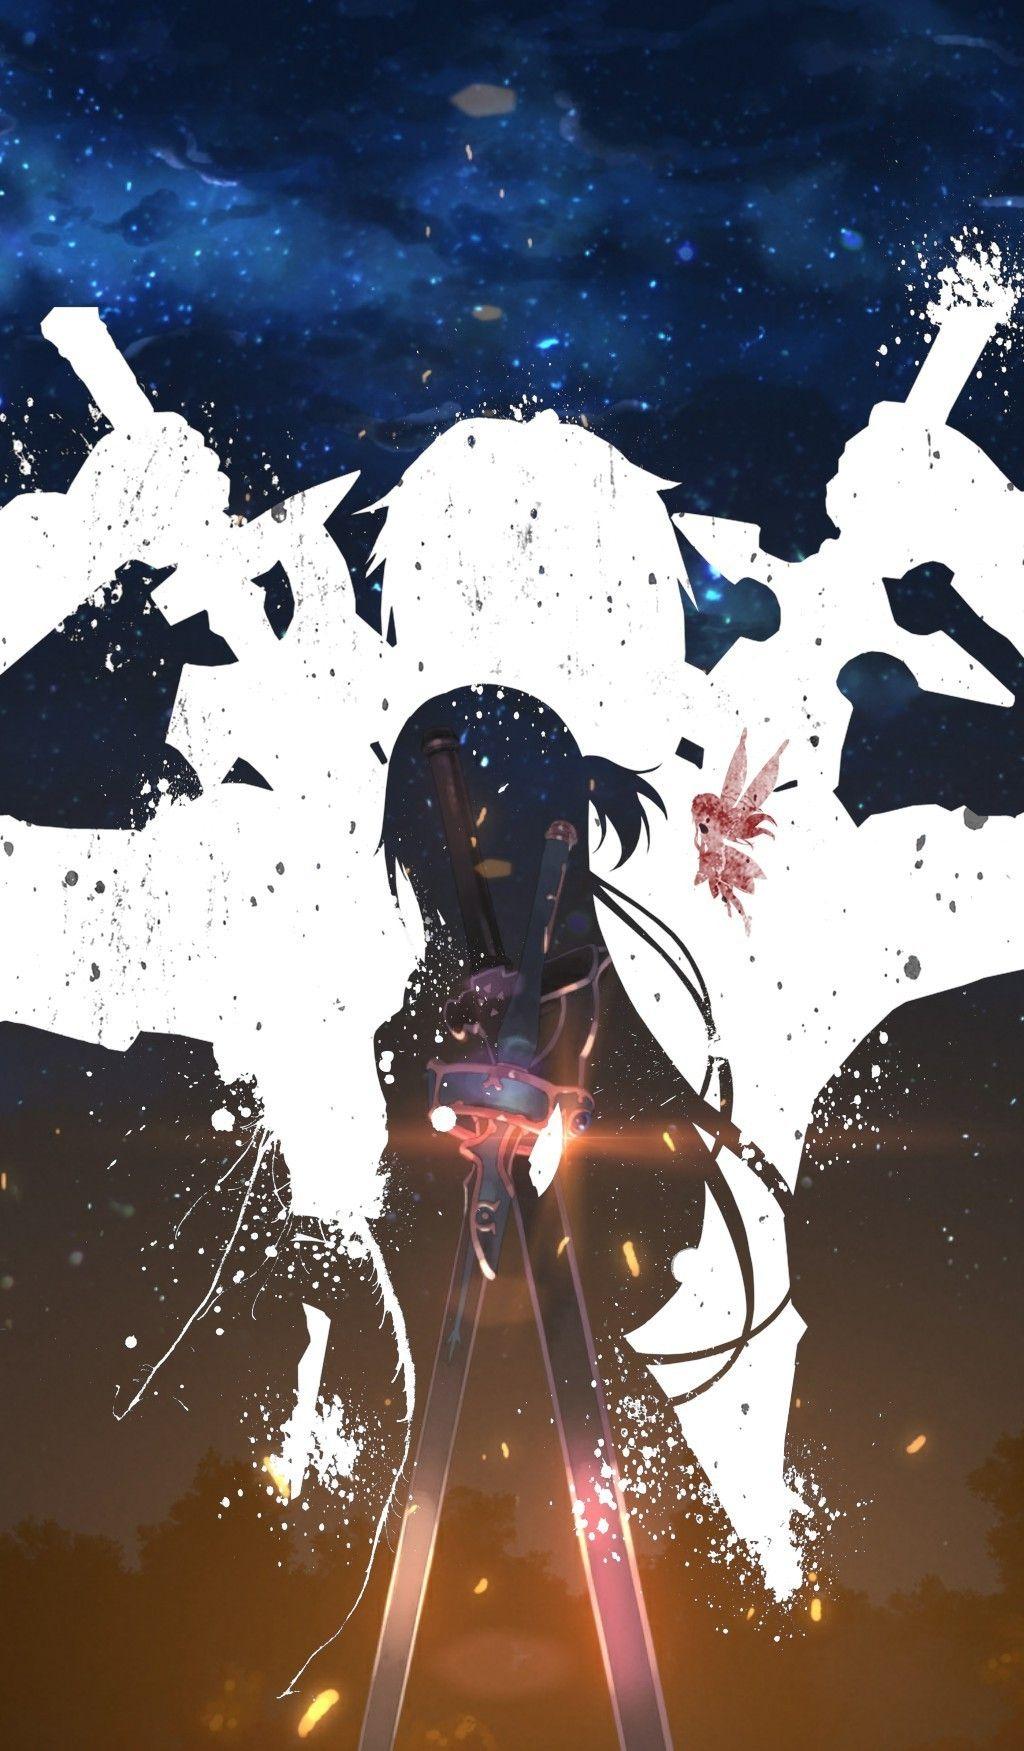 Sword Art Online Wallpapers Hd Desktop And Mobile Backgrounds